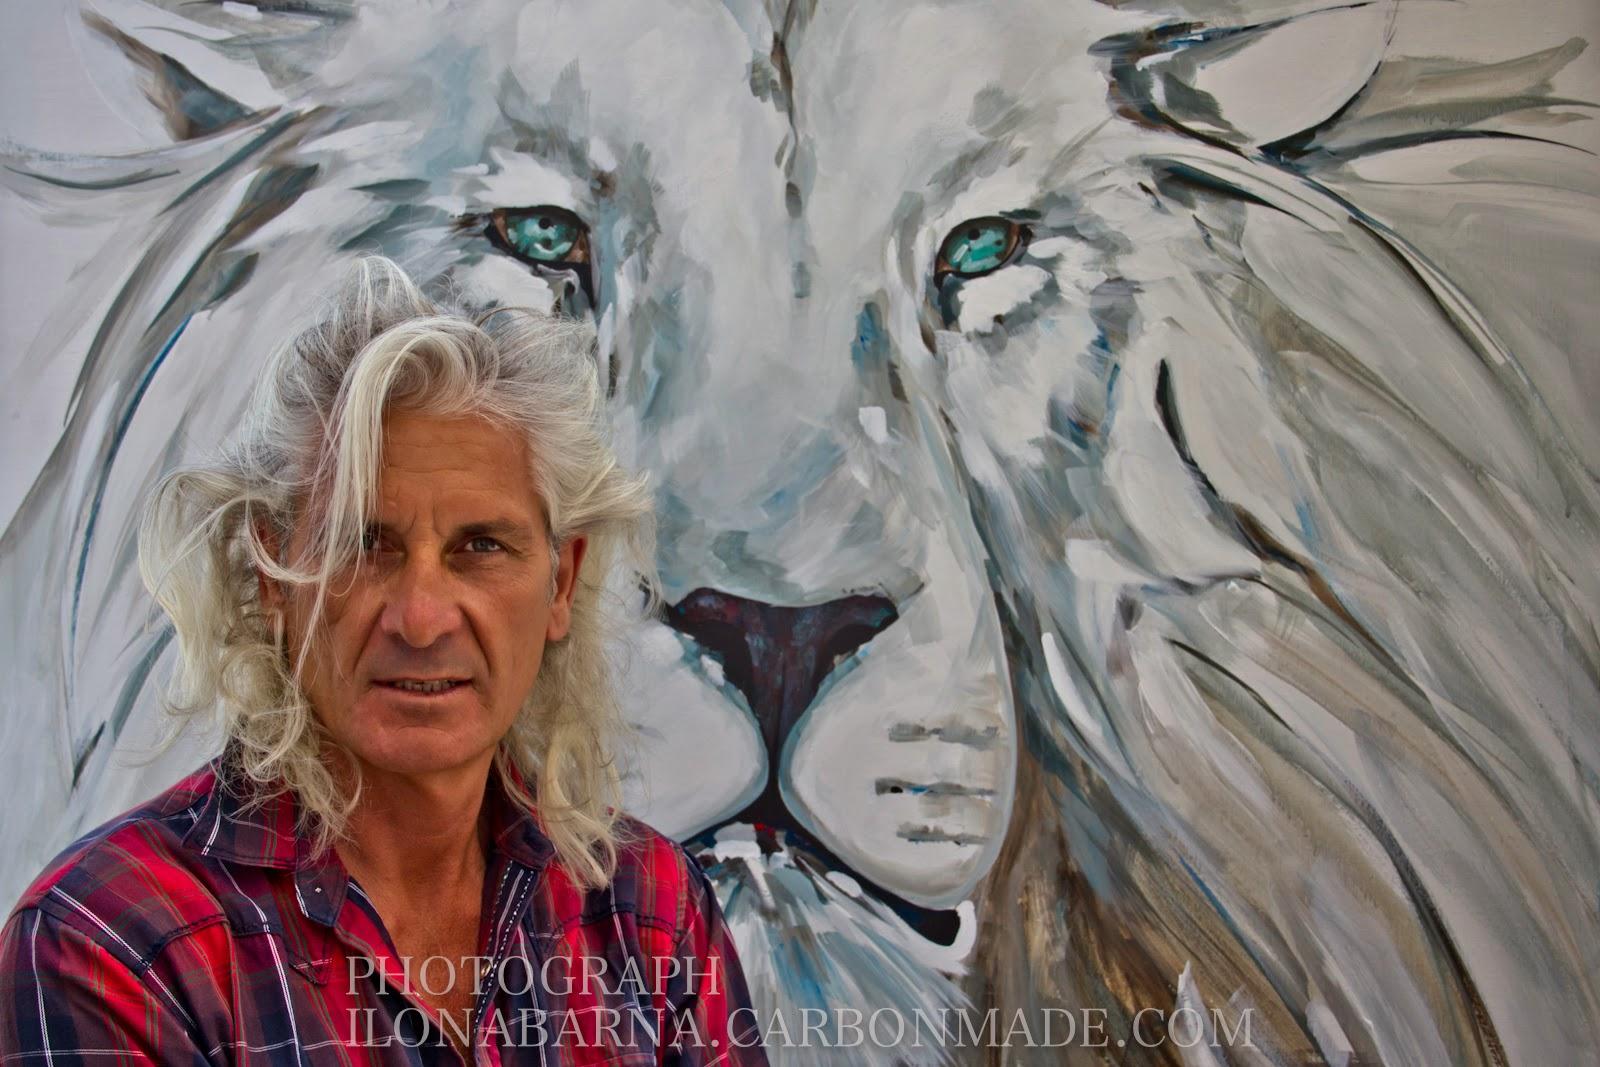 Artiste Peintre St Tropez ilona barna : ©ricco peintre st. tropezbiphoto